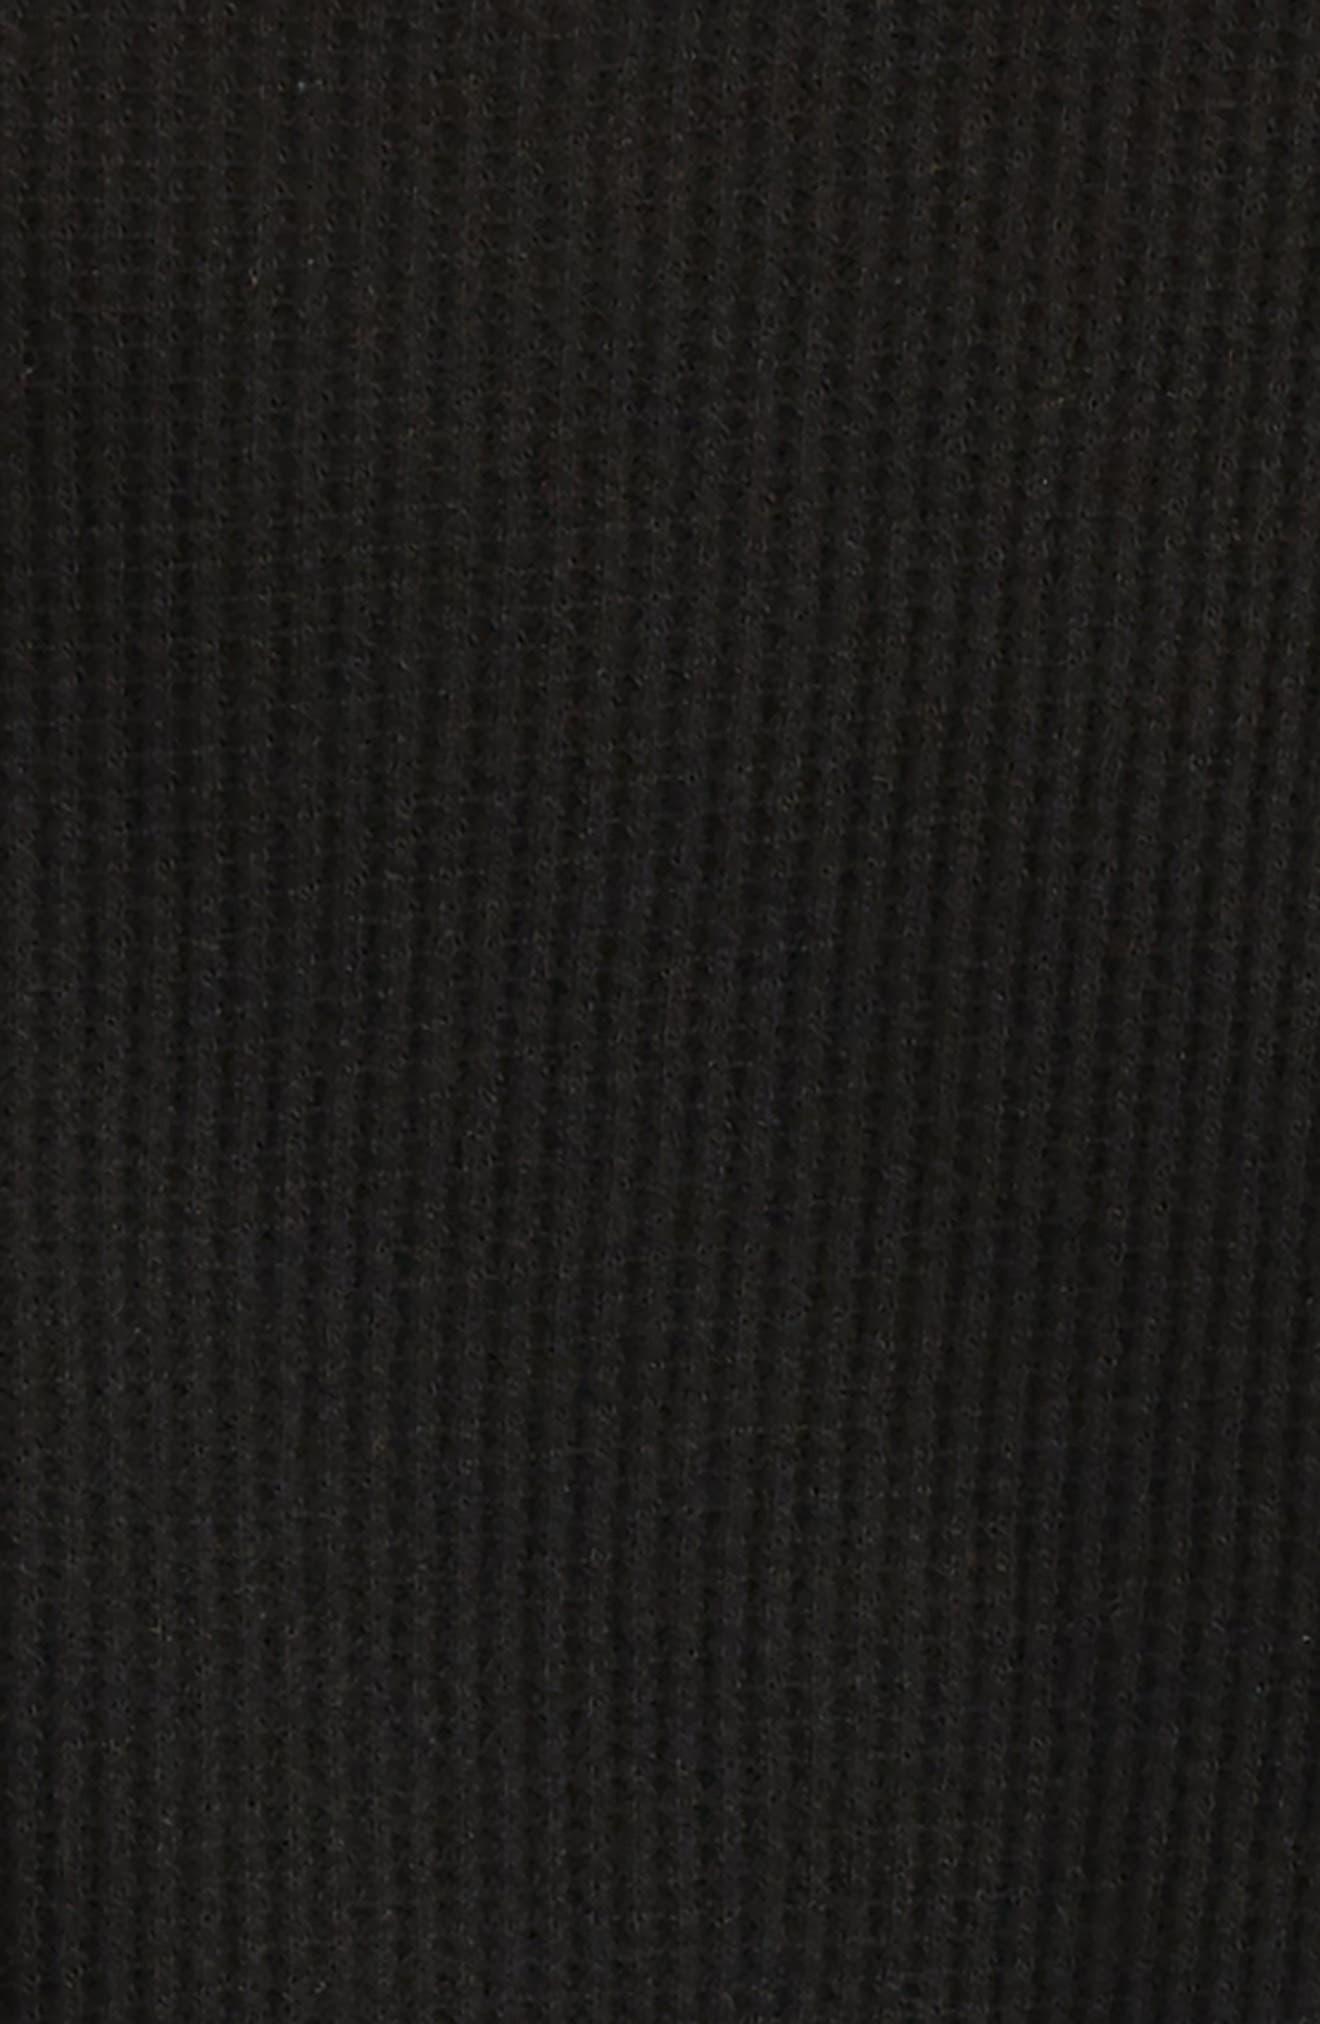 Thermal T-Shirt,                             Alternate thumbnail 2, color,                             001